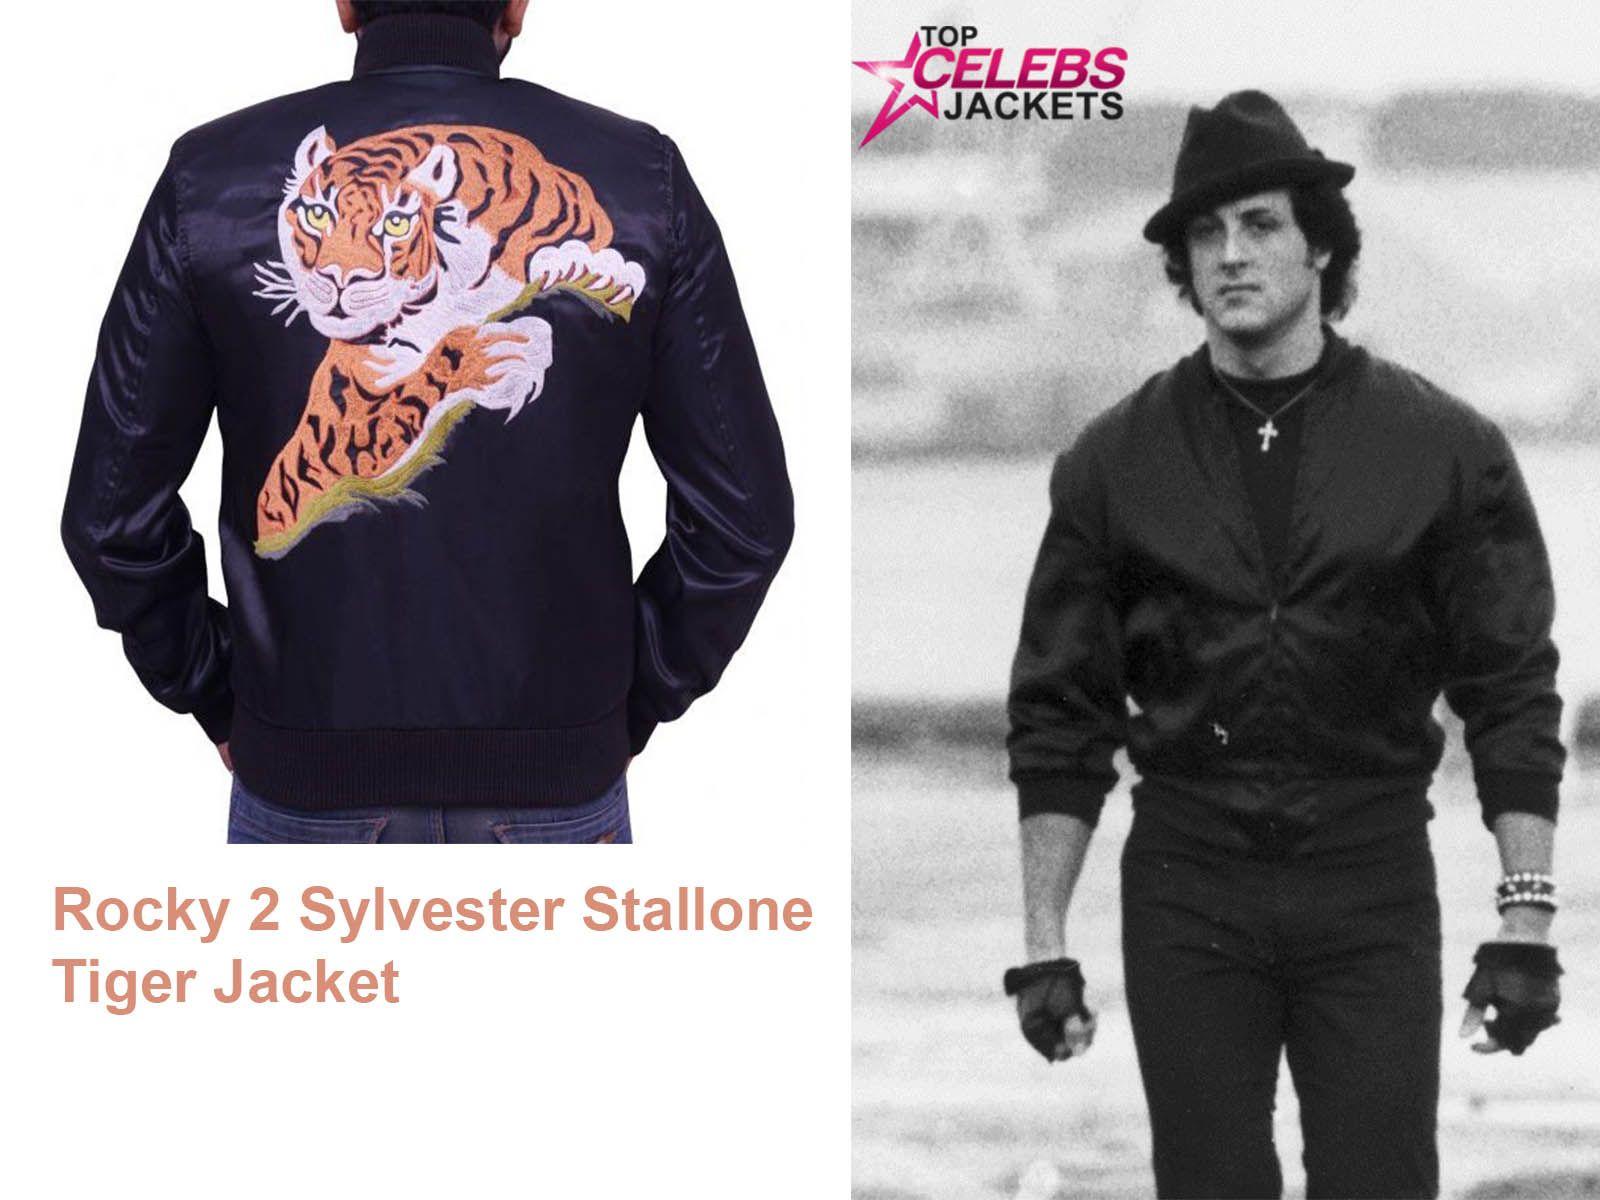 Rocky 2 Sylvester Stallone Tiger Jacket Rocky Sylvester Stallone